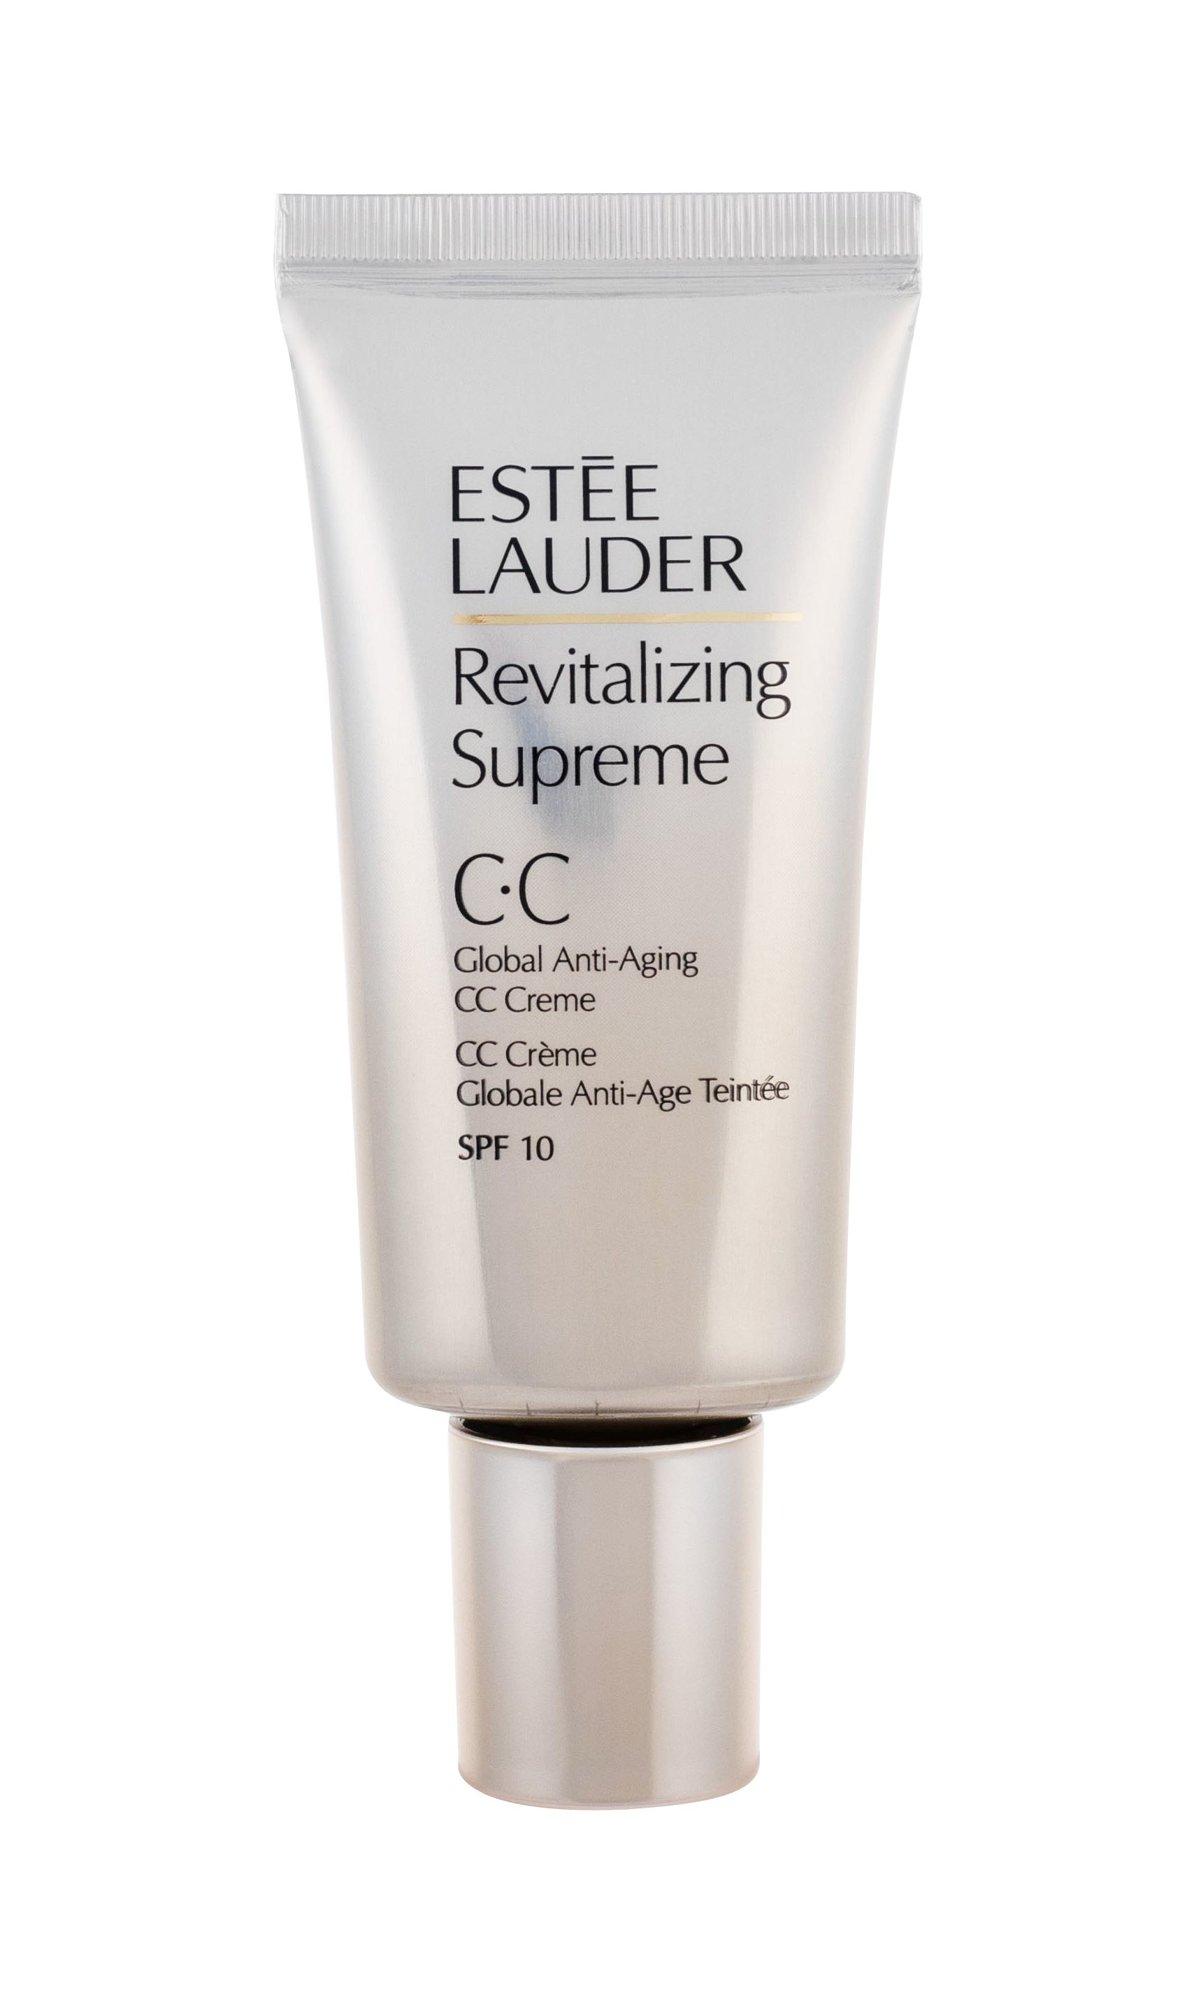 Estée Lauder Revitalizing Supreme CC Cream 30ml